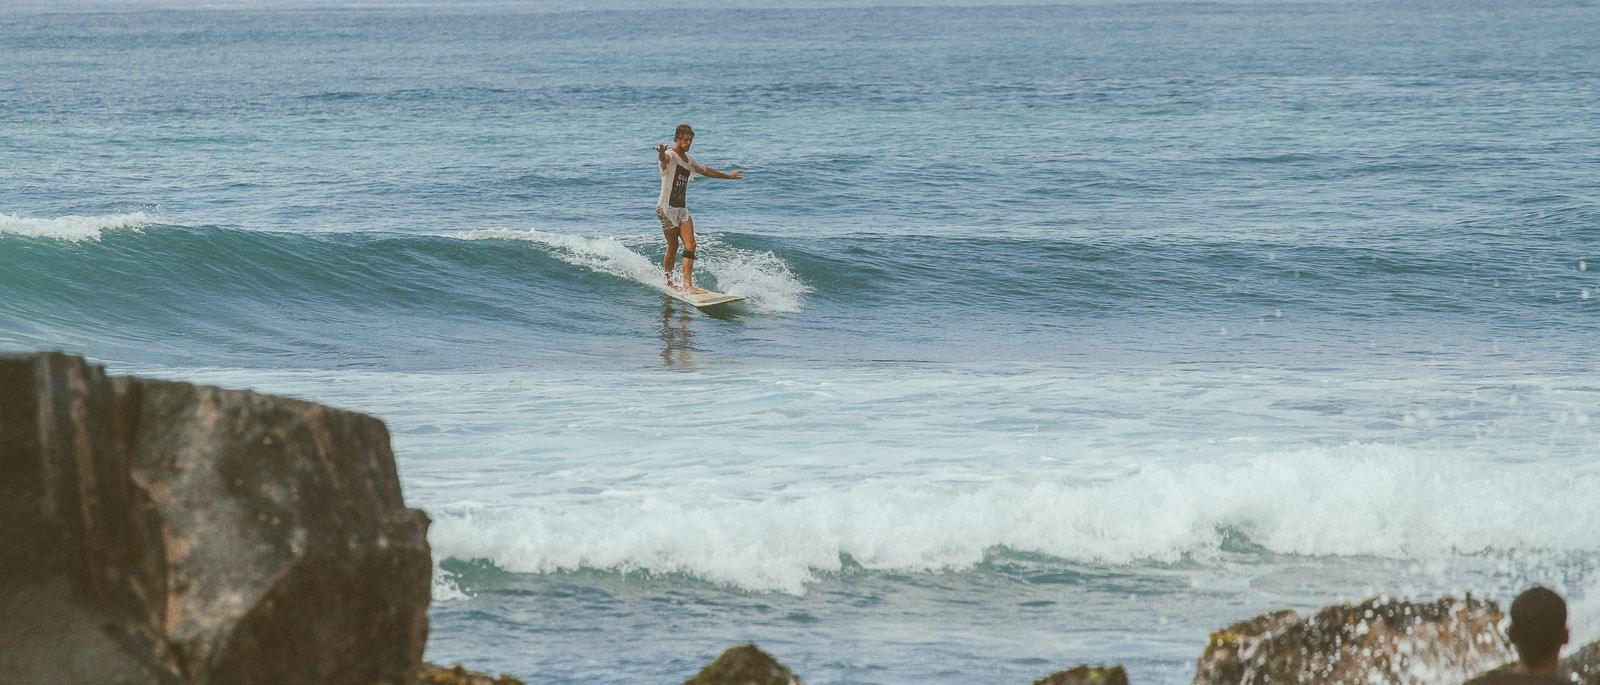 Sri Lanka-Lazy Left-Rams-Midigama-Surfing-Surf-Wave-Pointbreak-Longboard-Sunshinestories-IMG_3534